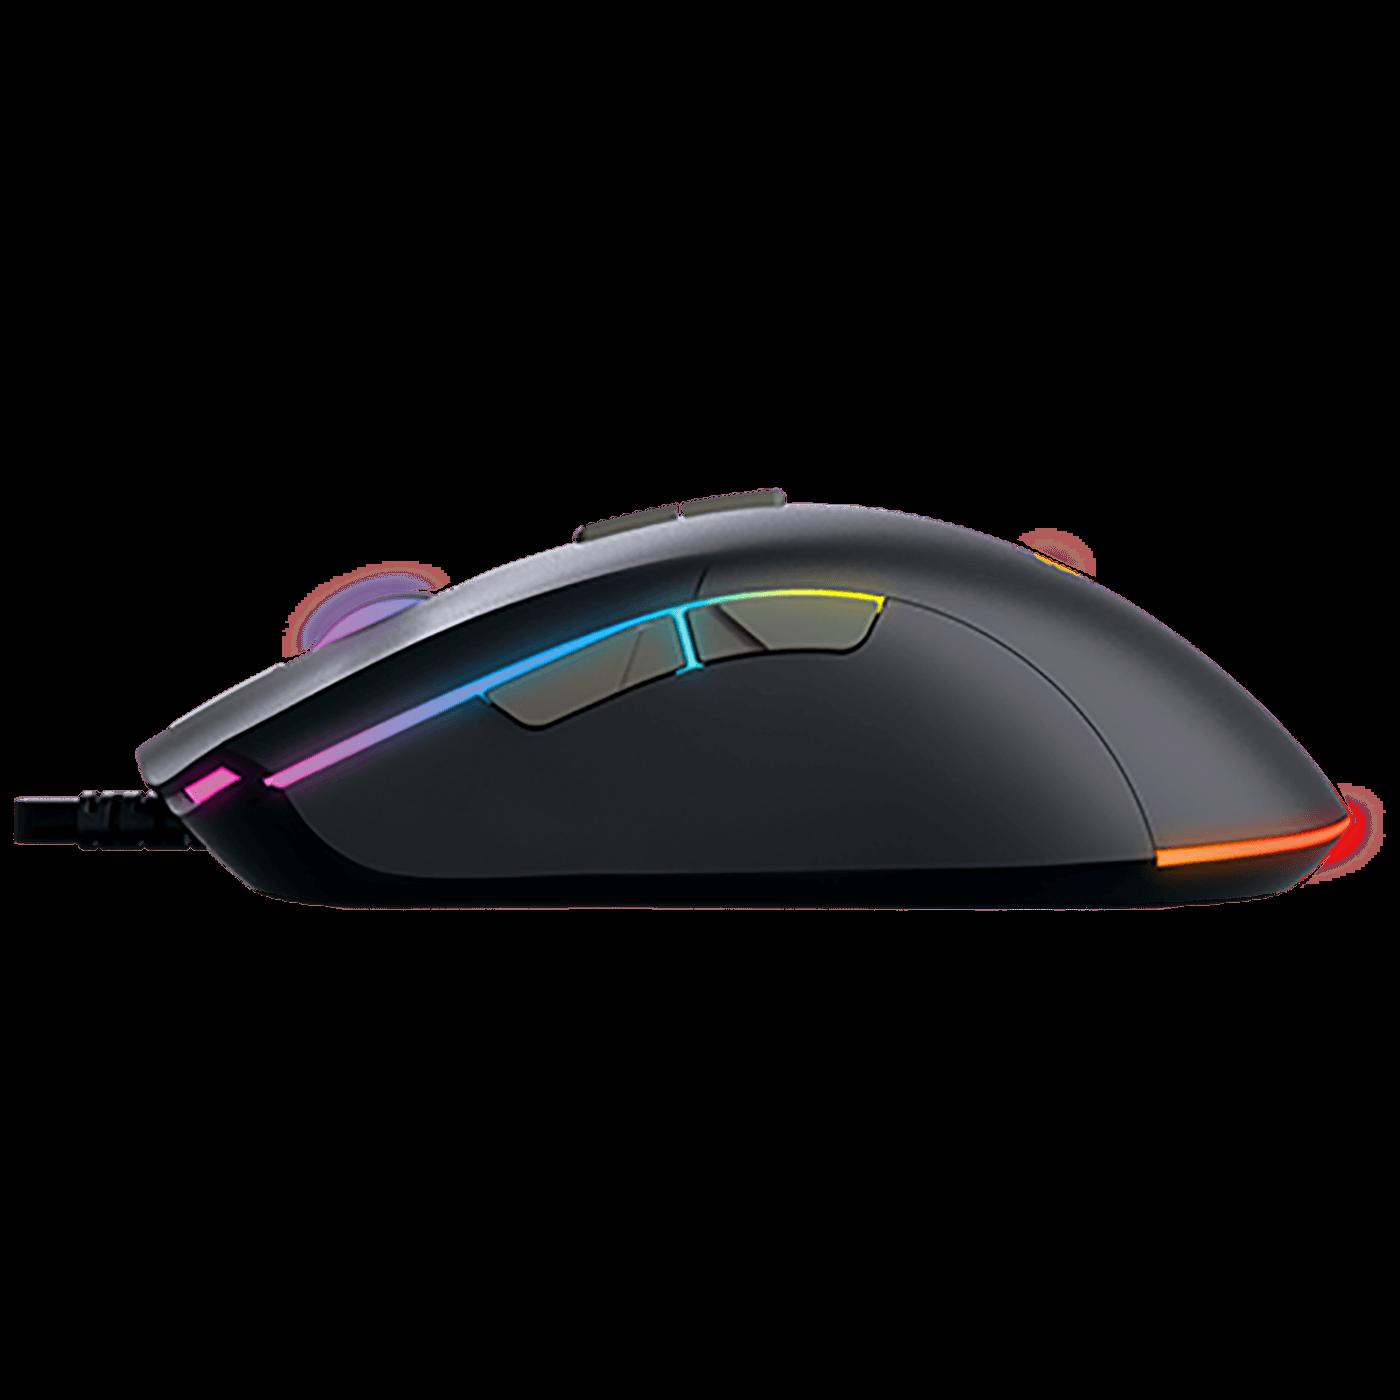 Miš optički, gaming, 10 000 dpi, USB